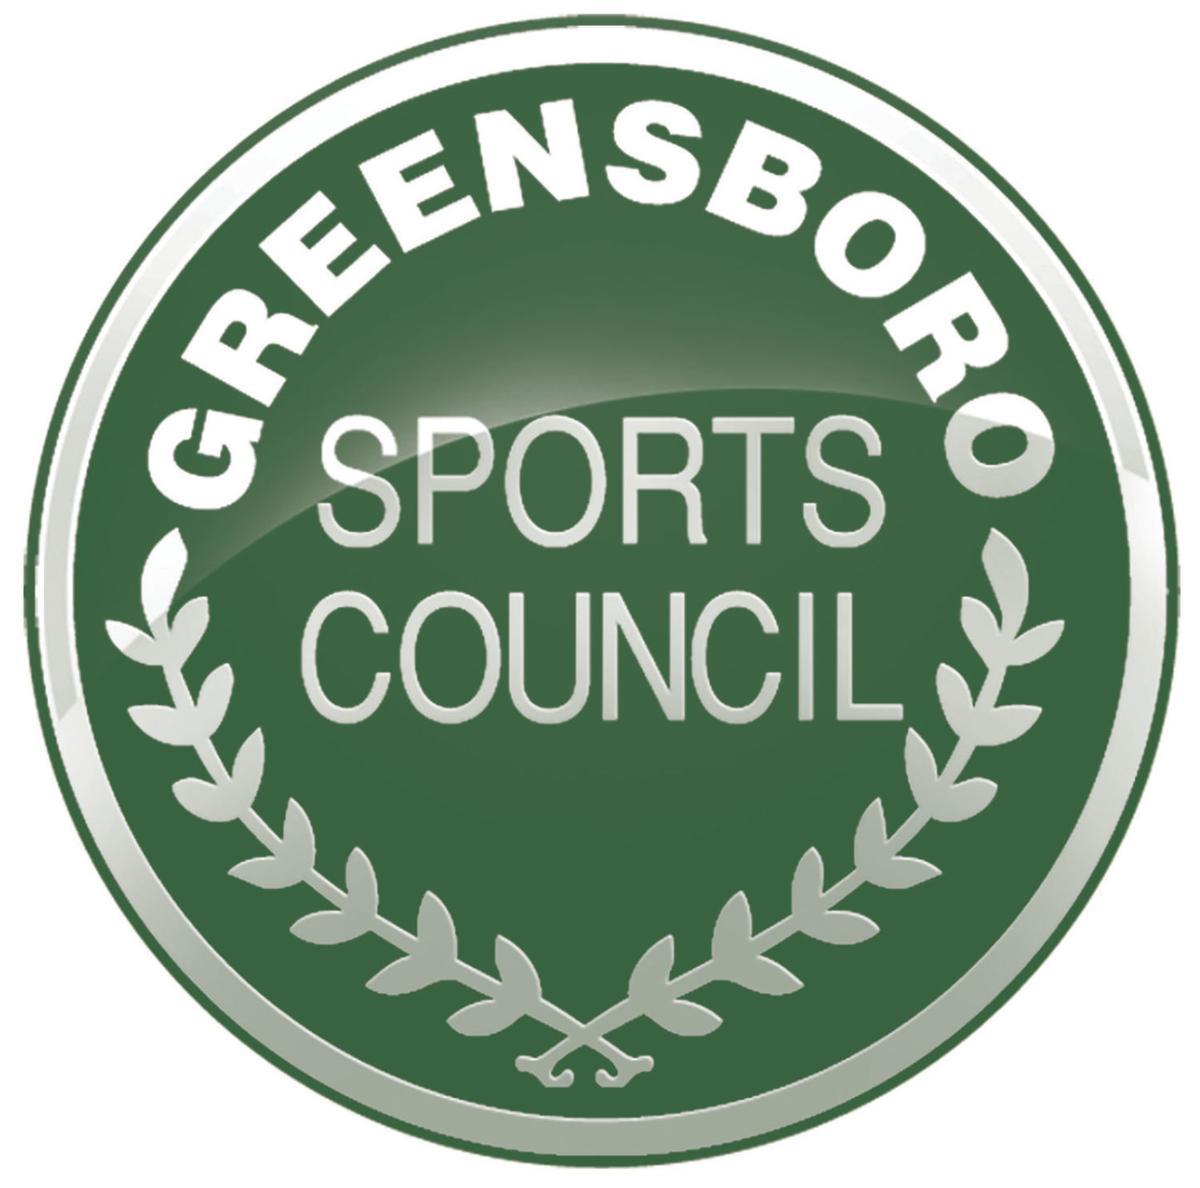 greensboro sports council logo 052218